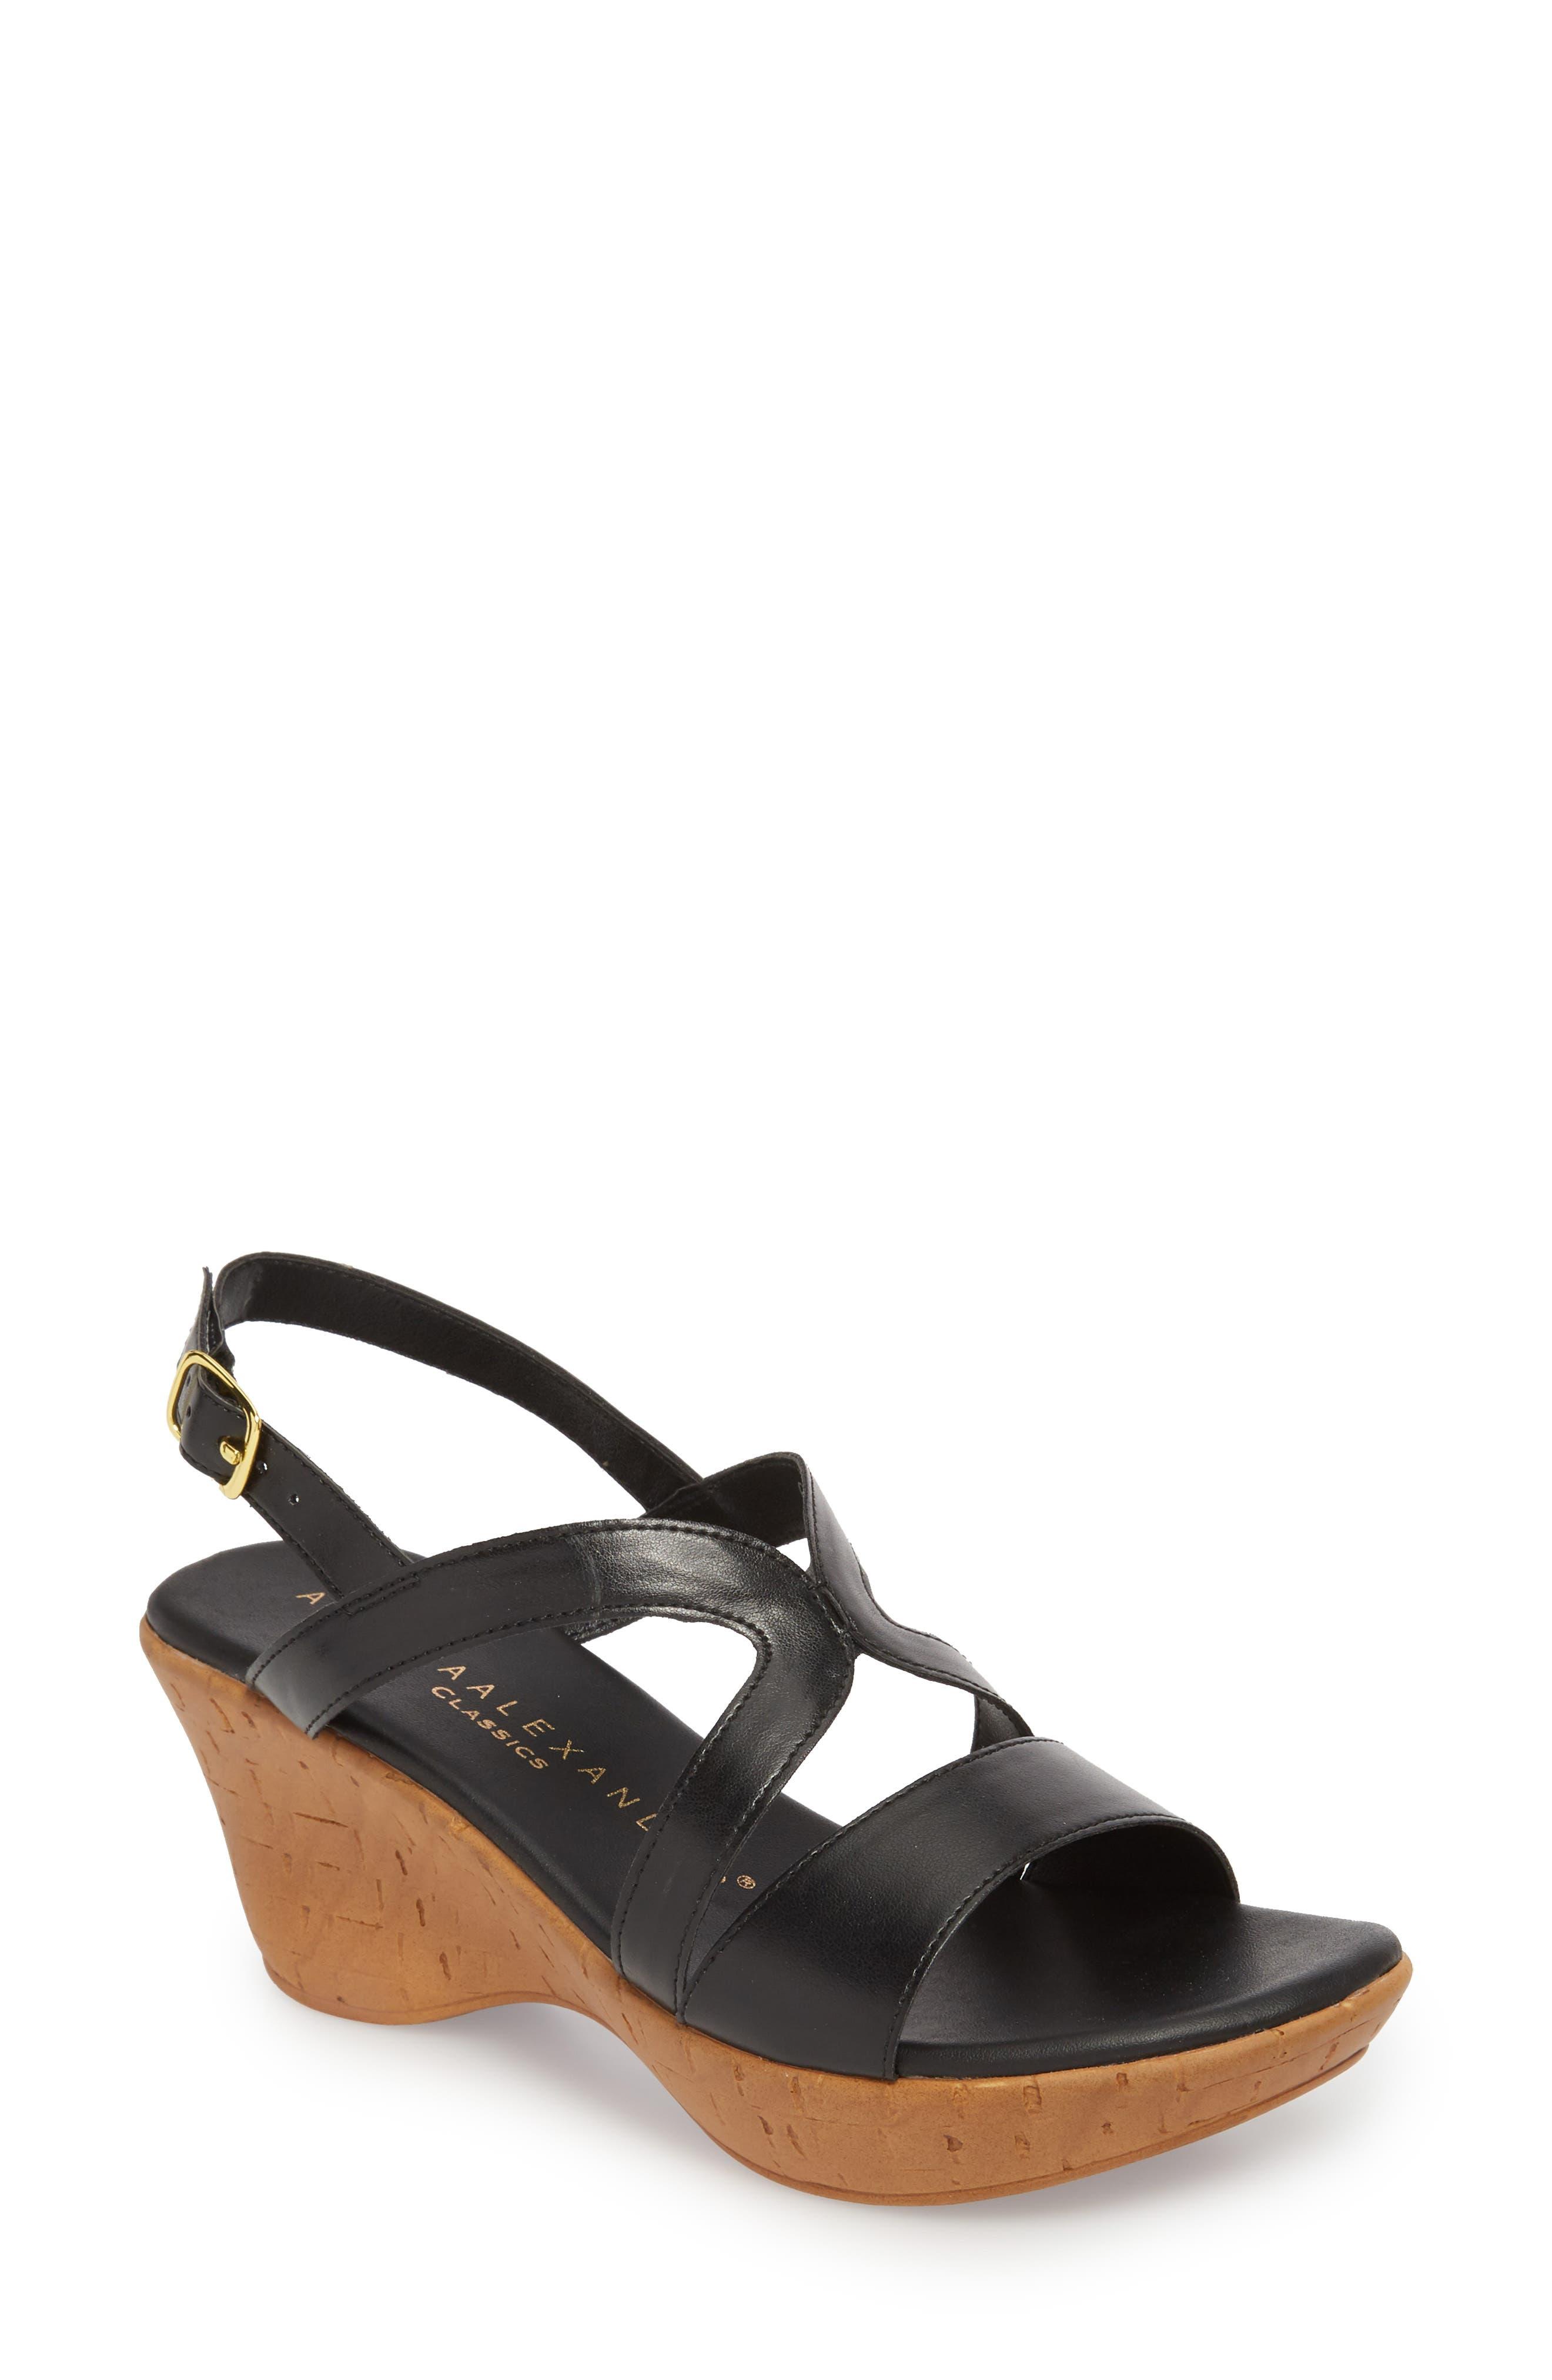 Athena Alexander Pomade Wedge Sandal, Black